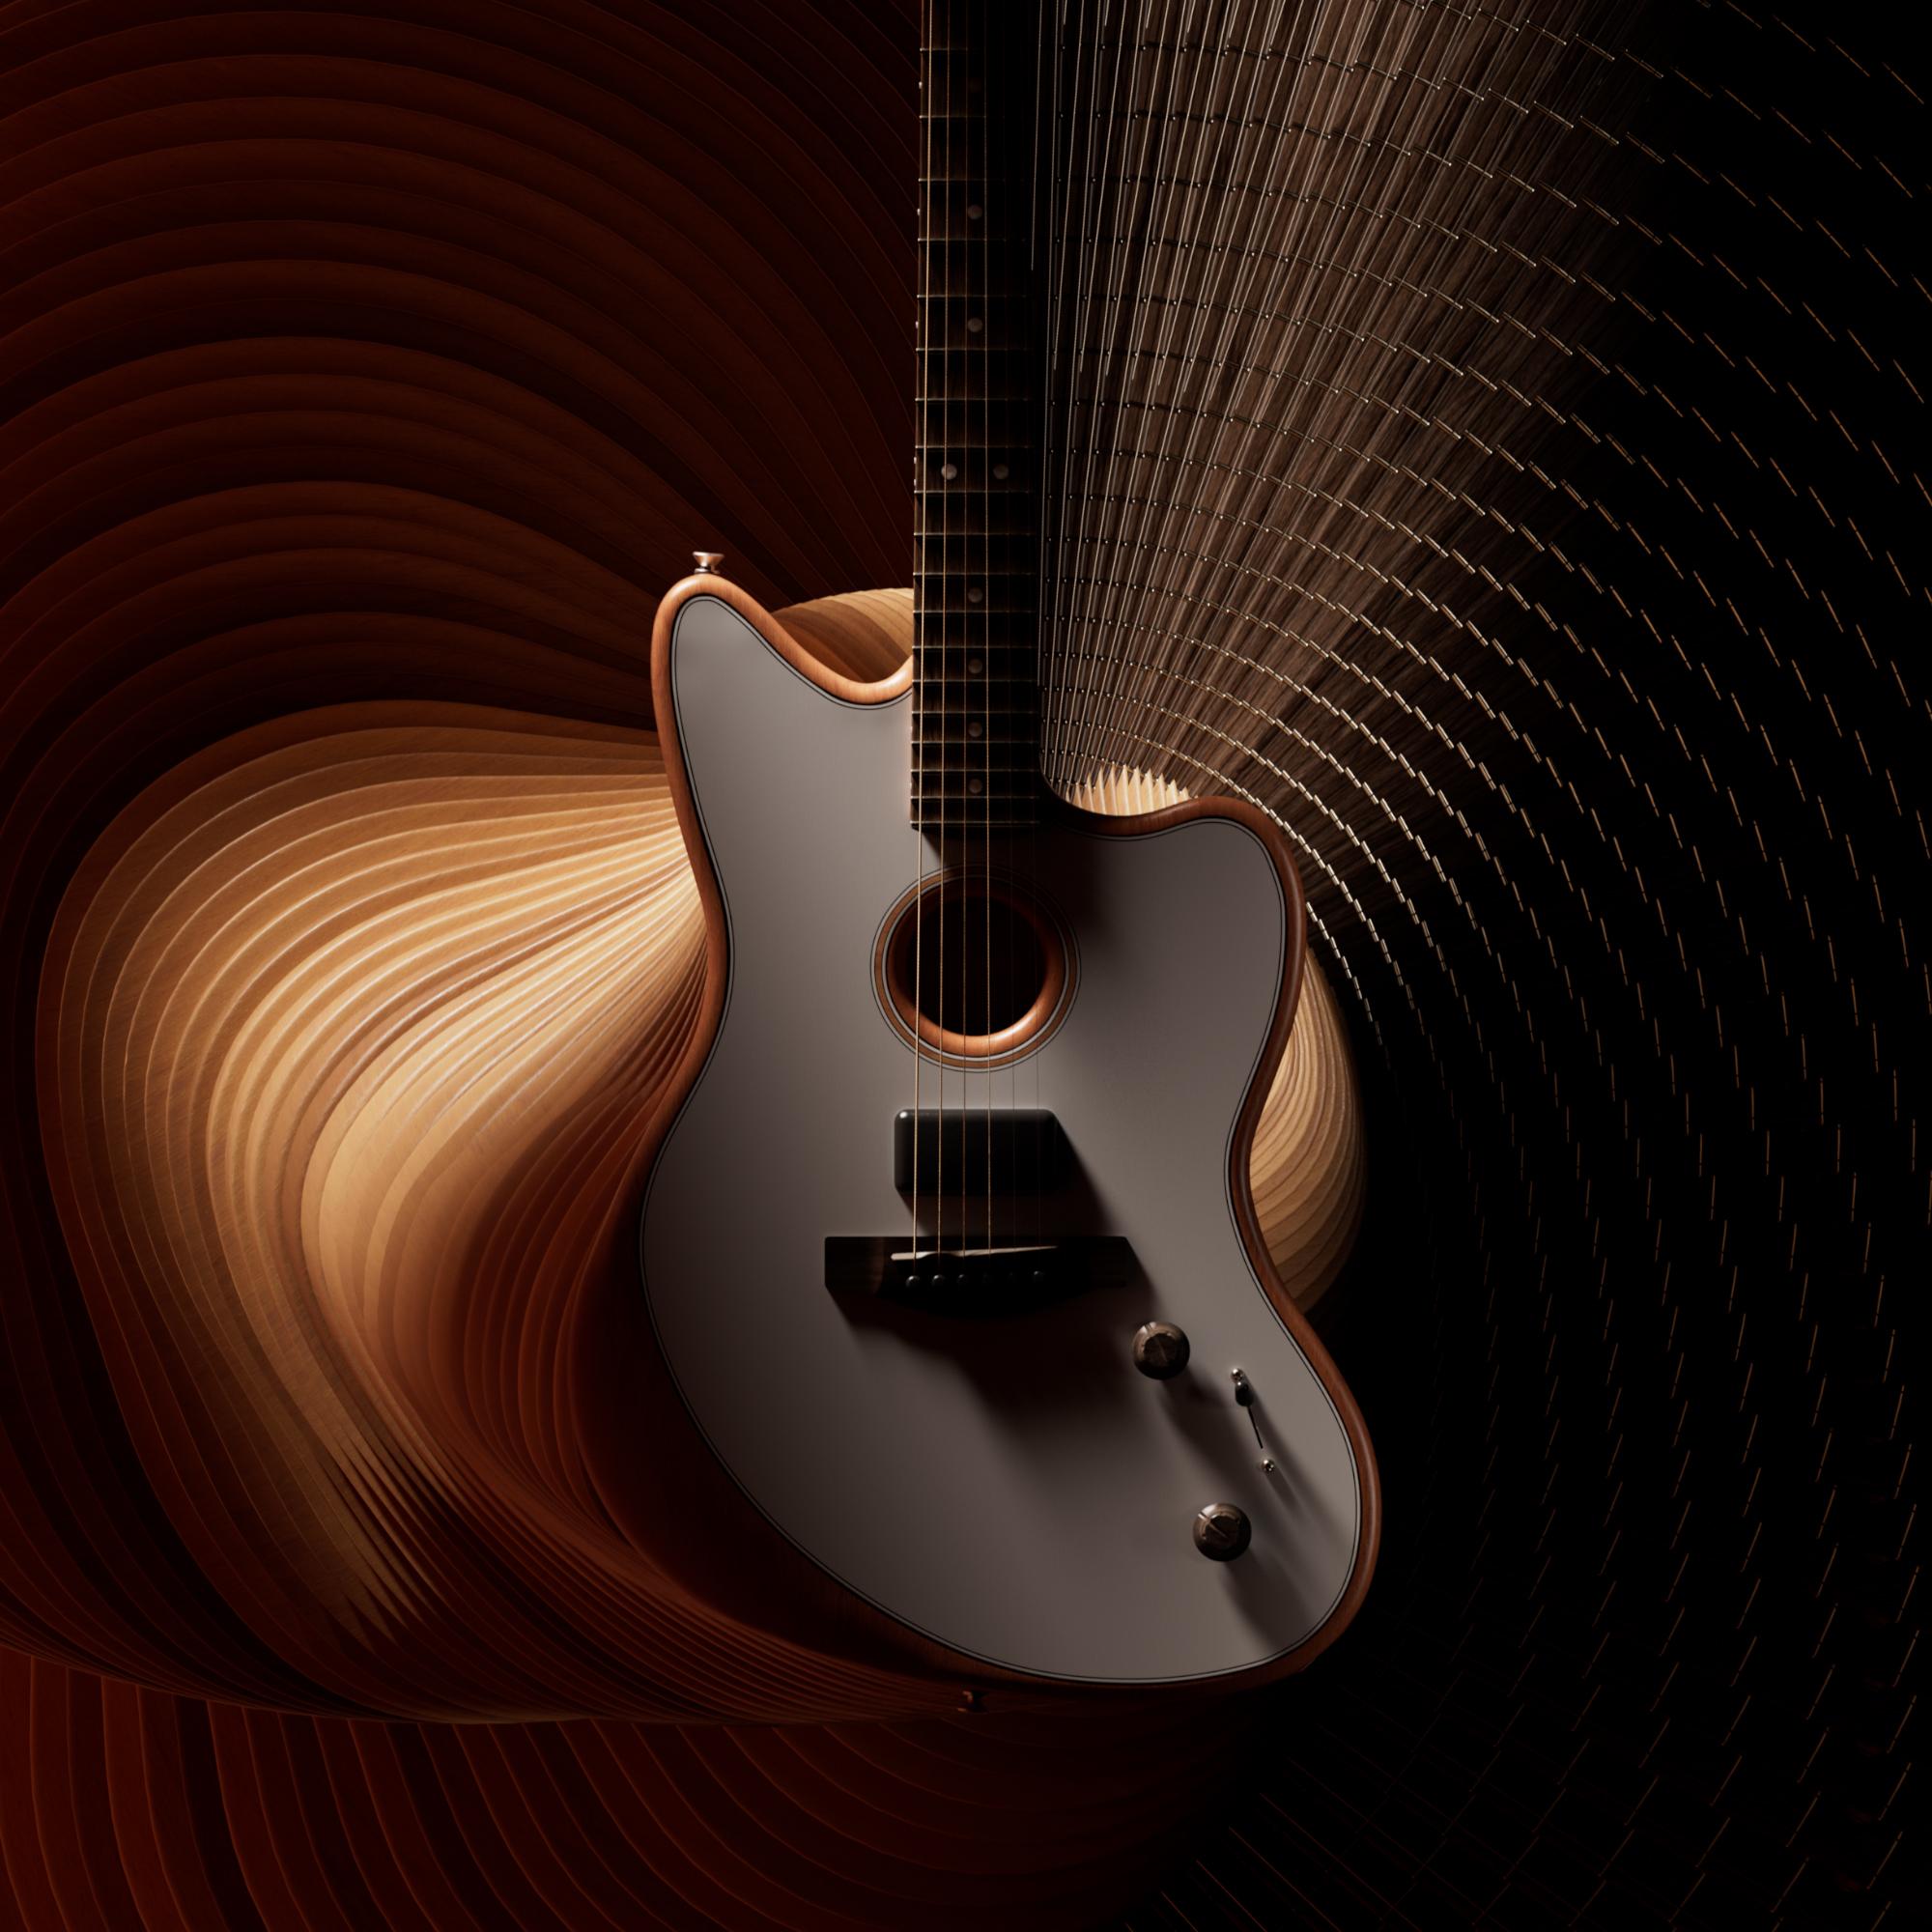 Fender Acoustication